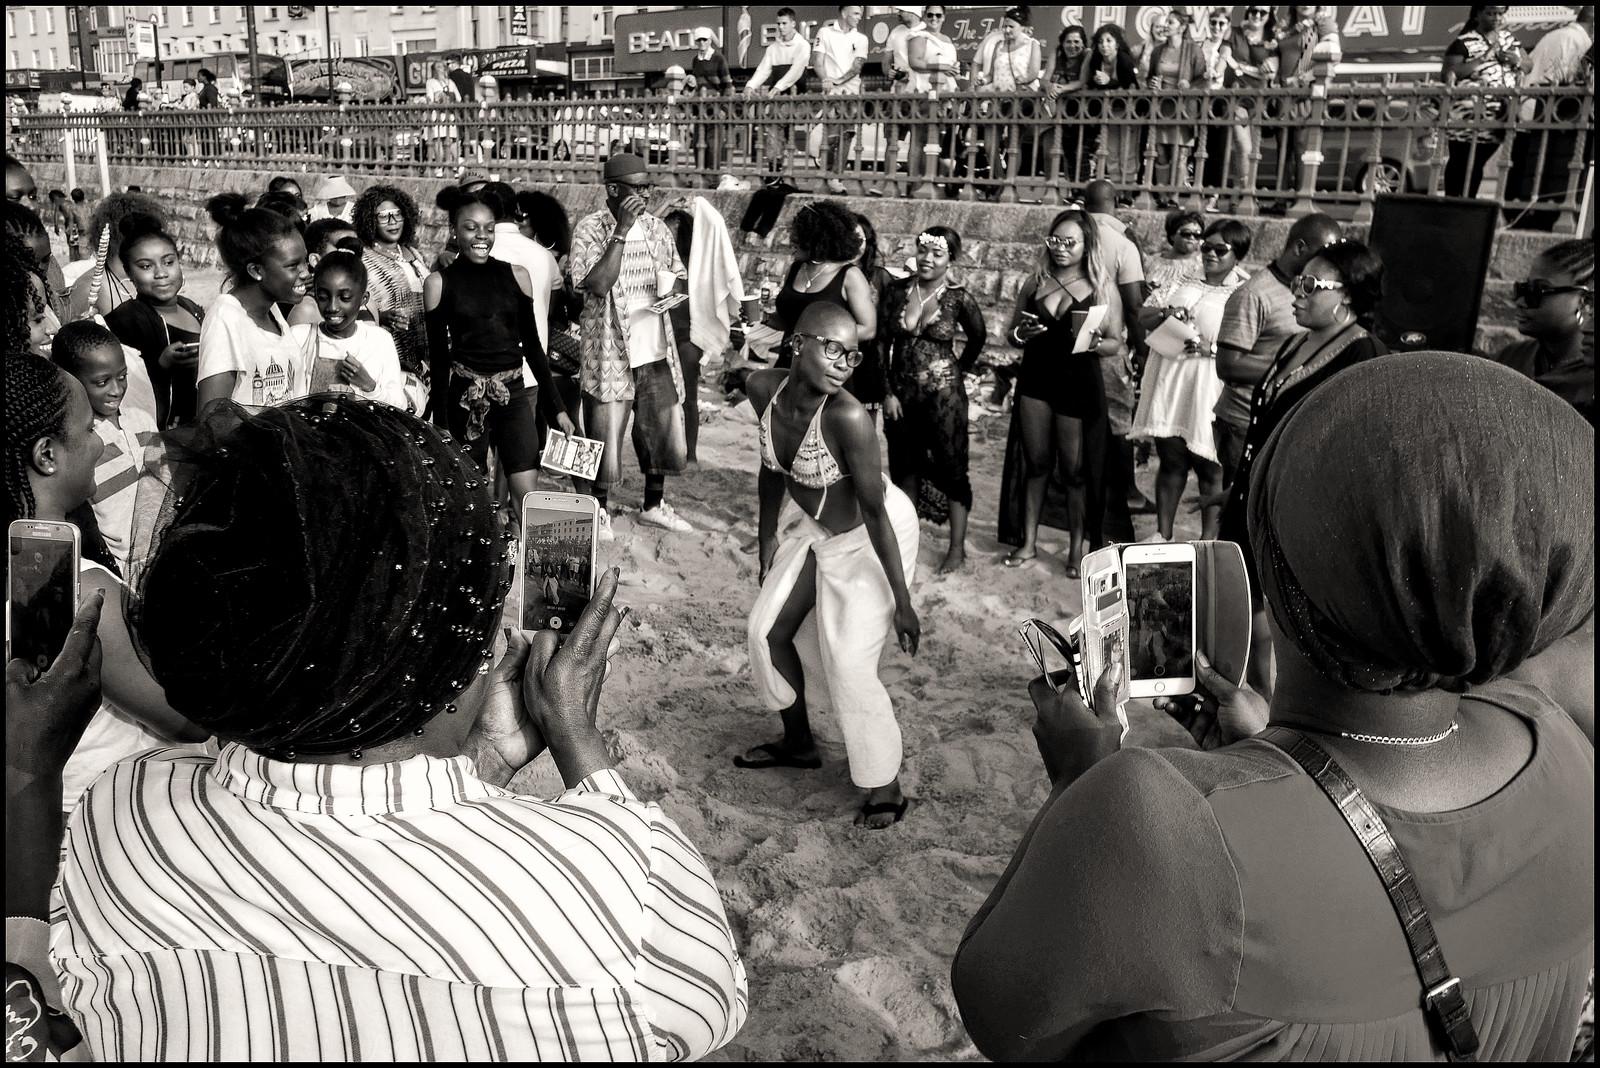 Dancing on the Beach, Margate | by davemason